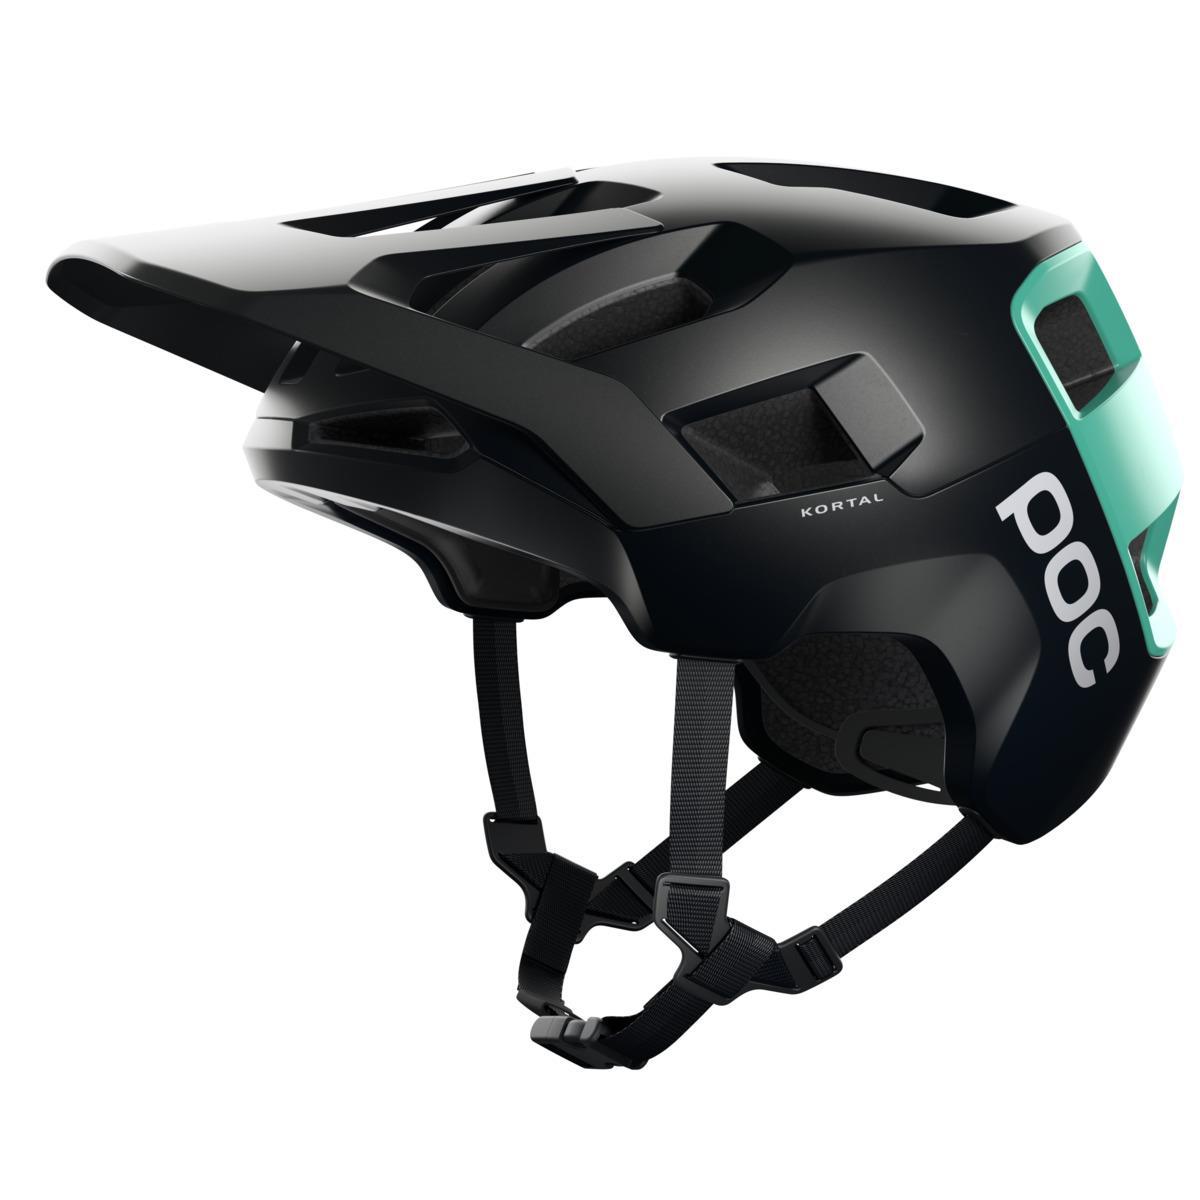 Helmet Kortal Uranium Black / Fluorite Green size XS-S (51-54)